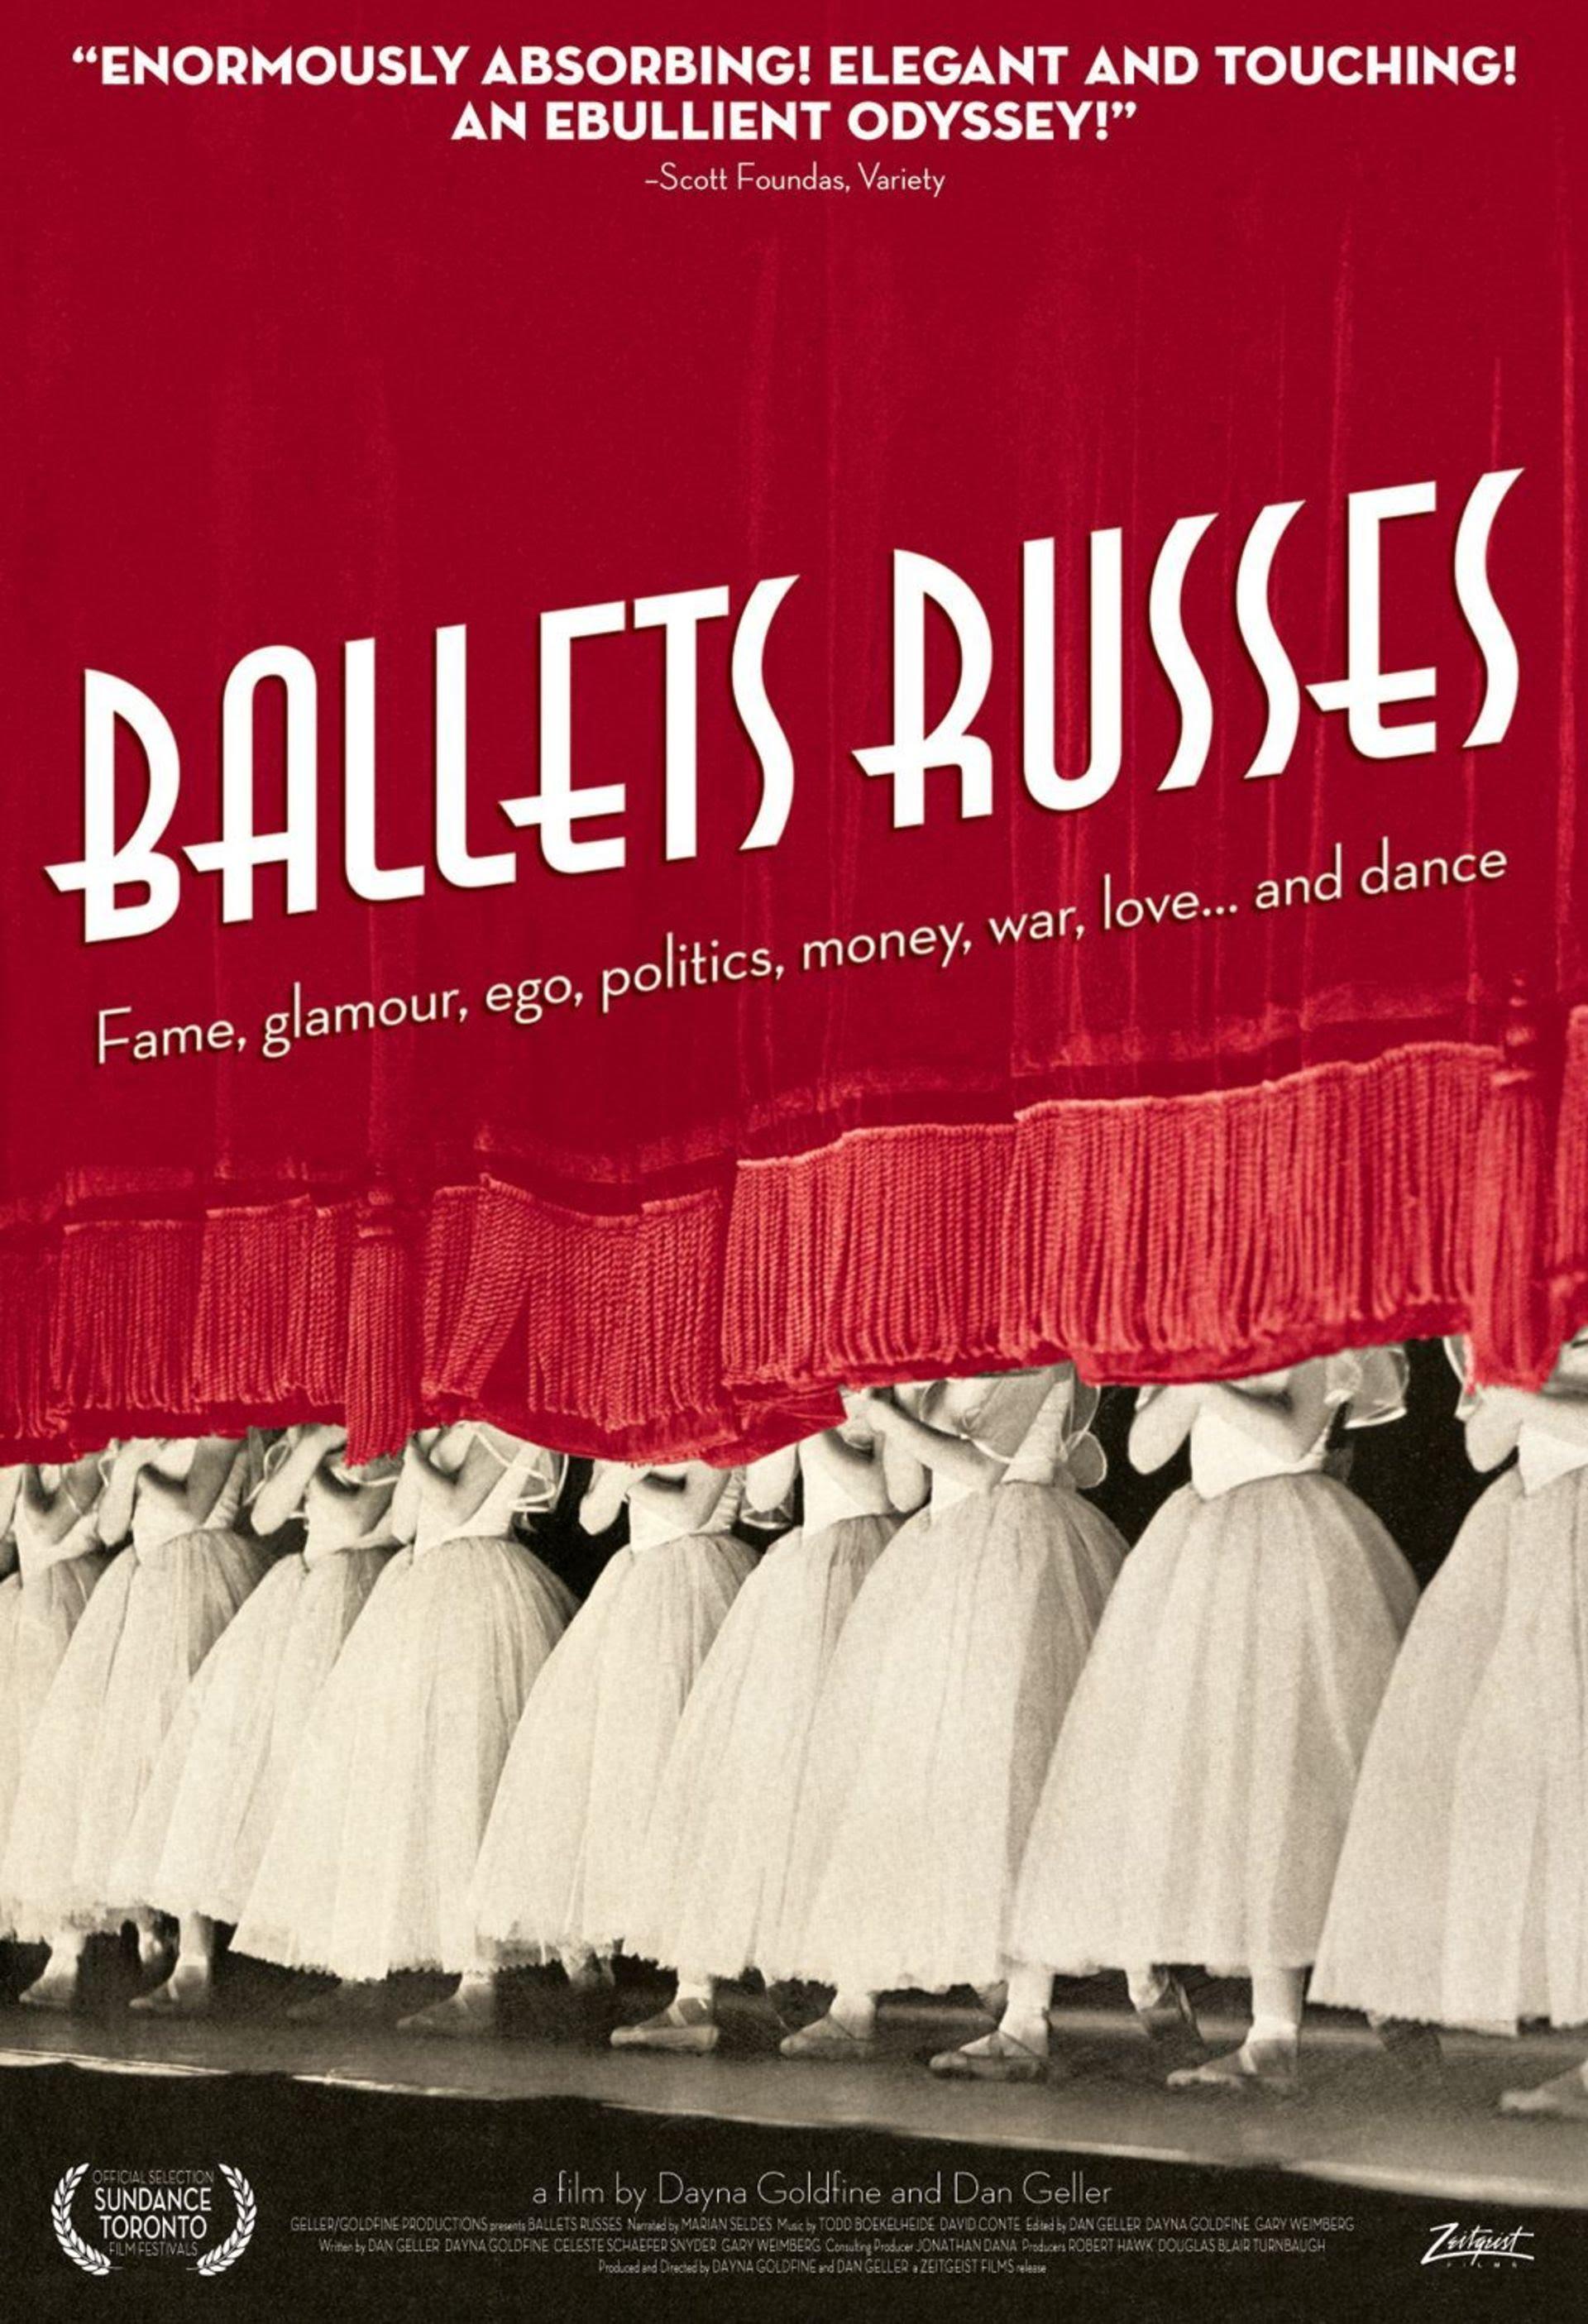 ballet-russes